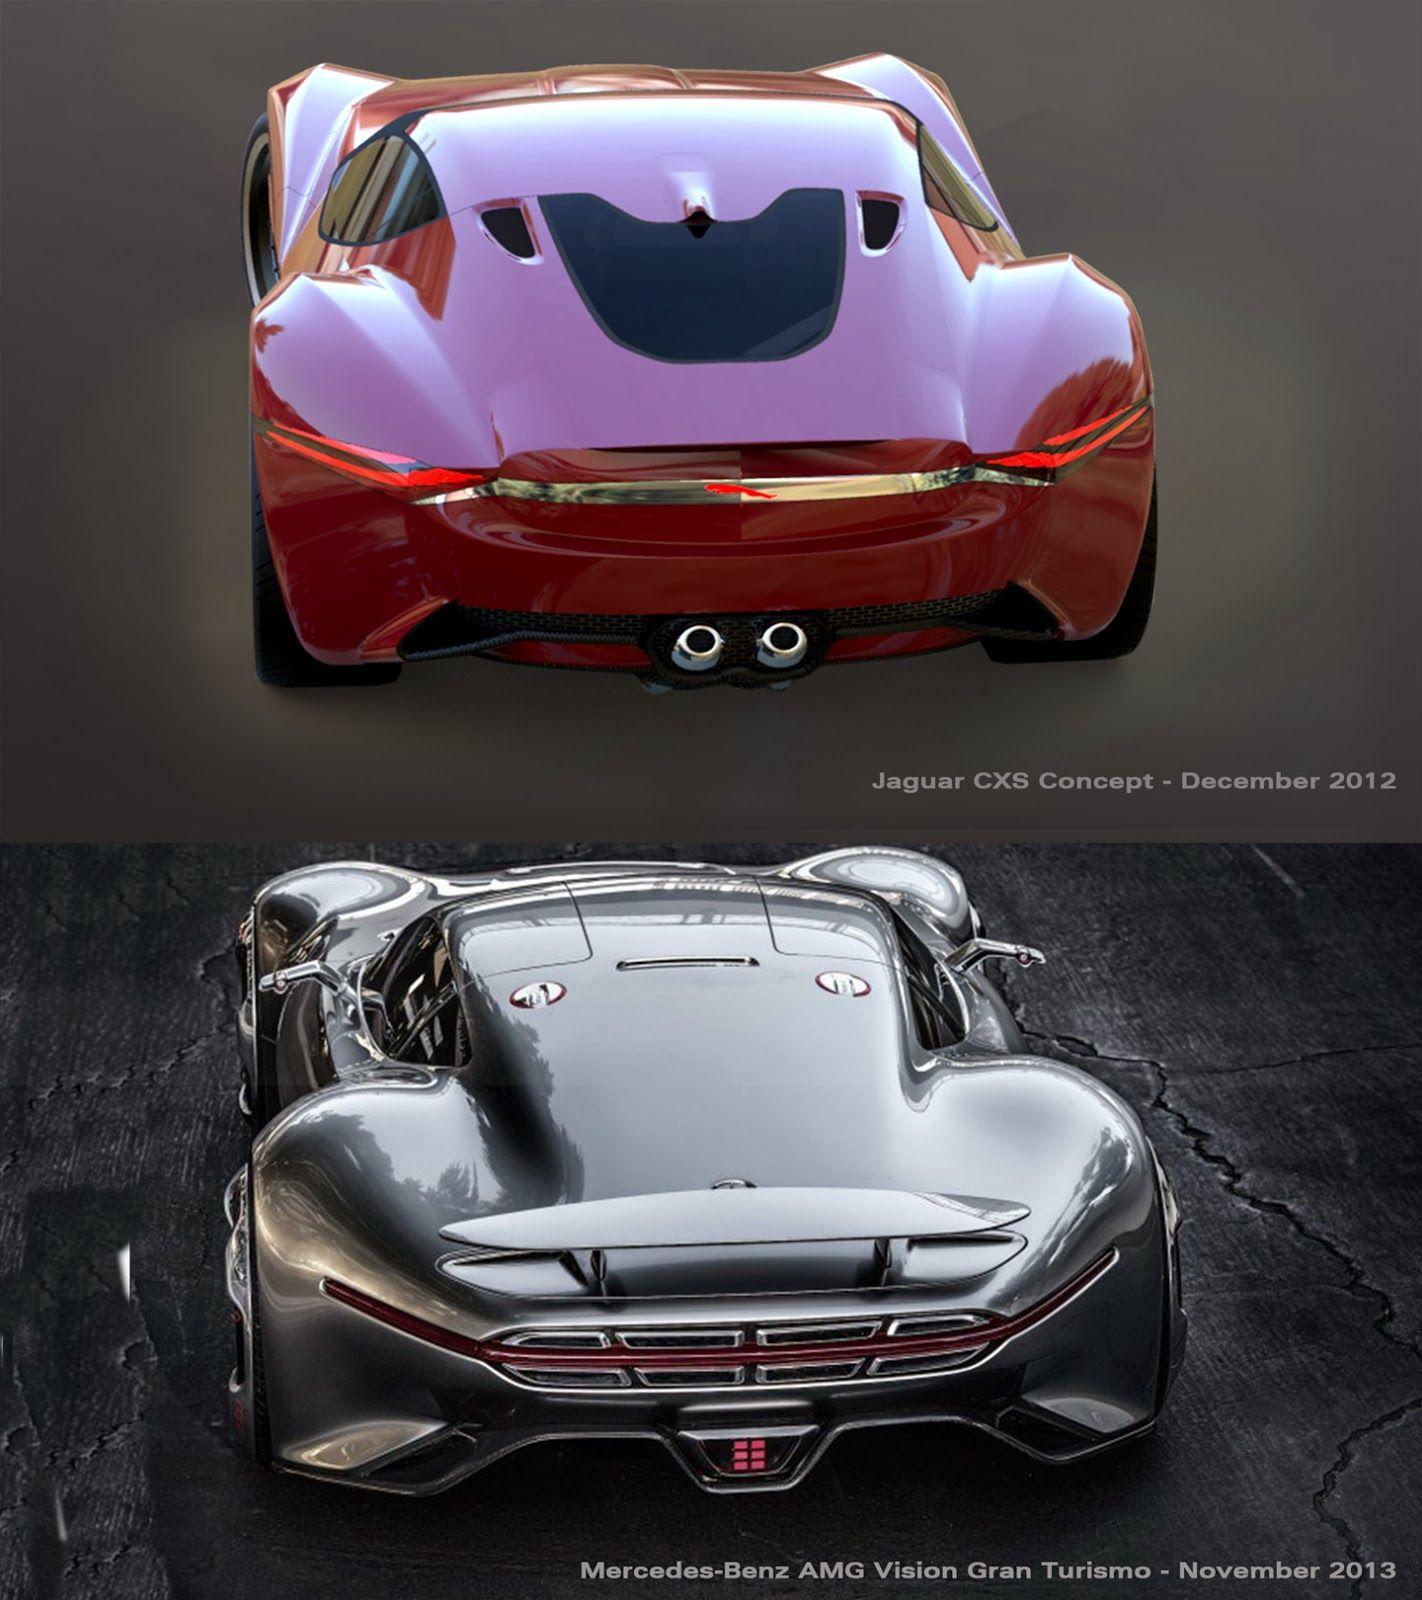 Jaguar Concept: Jaguar CXS Concept Vs Mercedes-Benz AMG GT WWW.CLUBGTSPORT